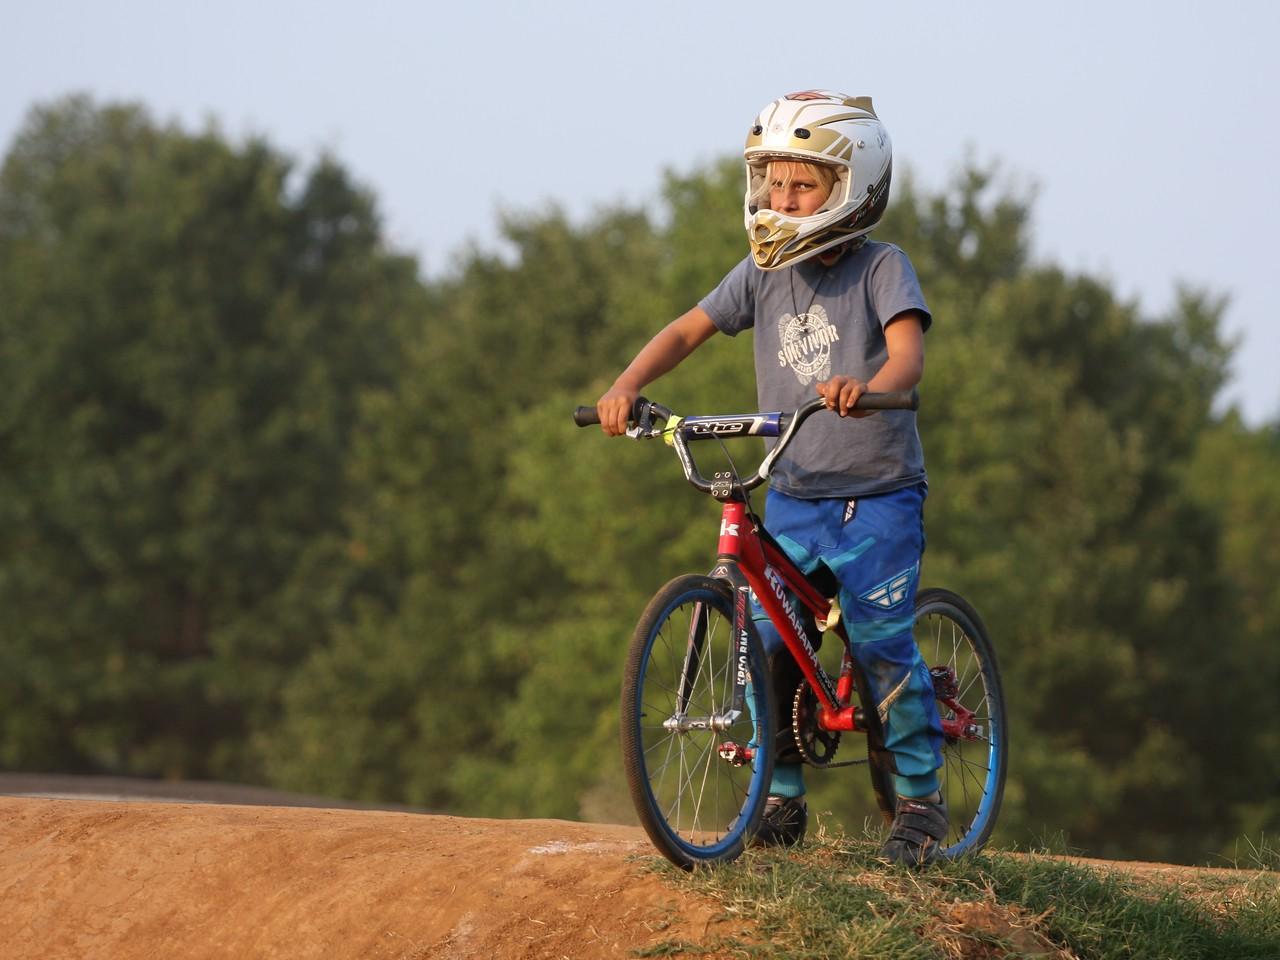 BMX Bike Racing at Tom Sawyer